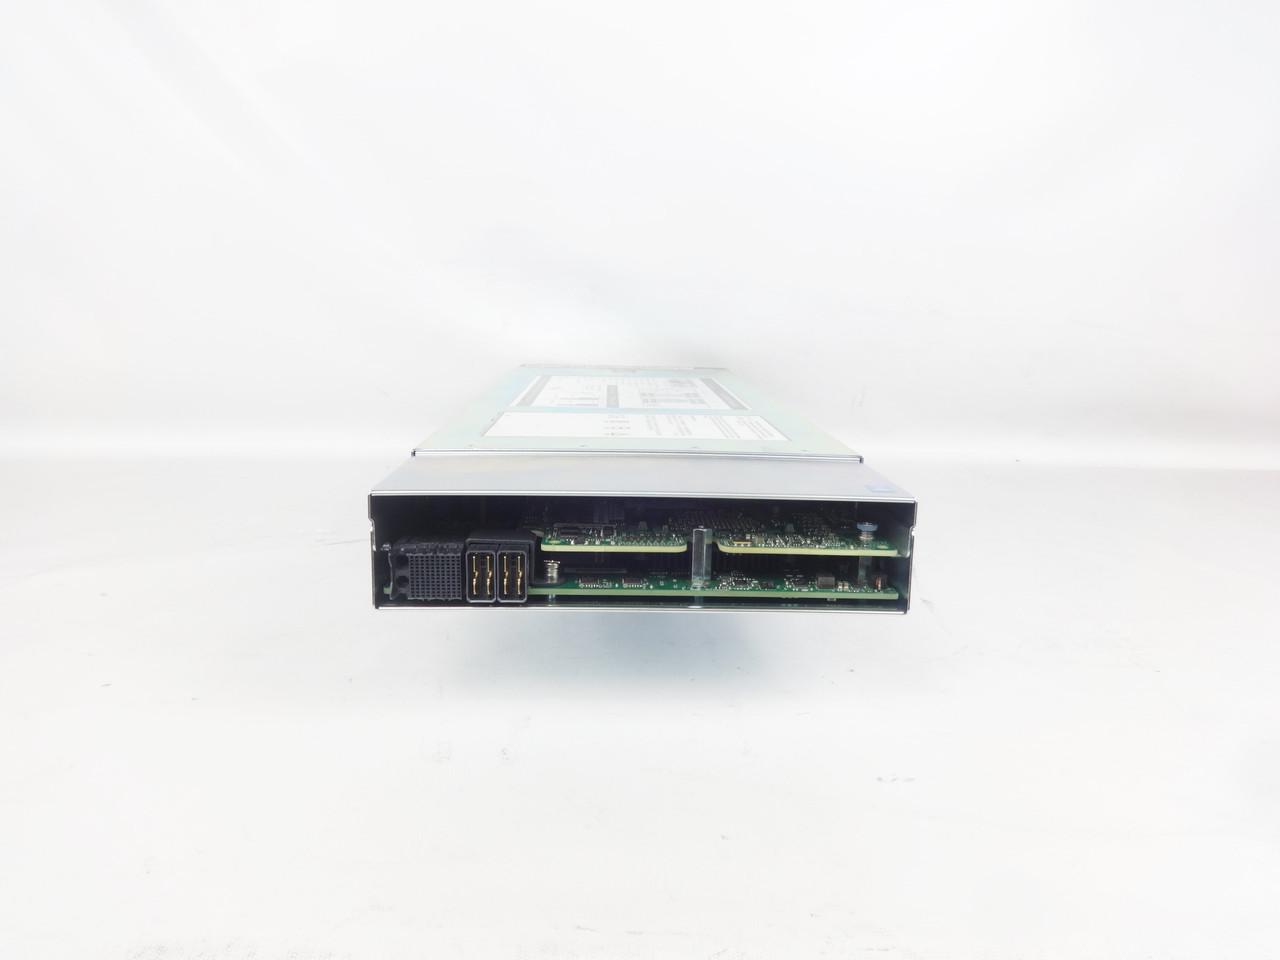 Refurbished Cisco UCS B200 M4 Blade Server